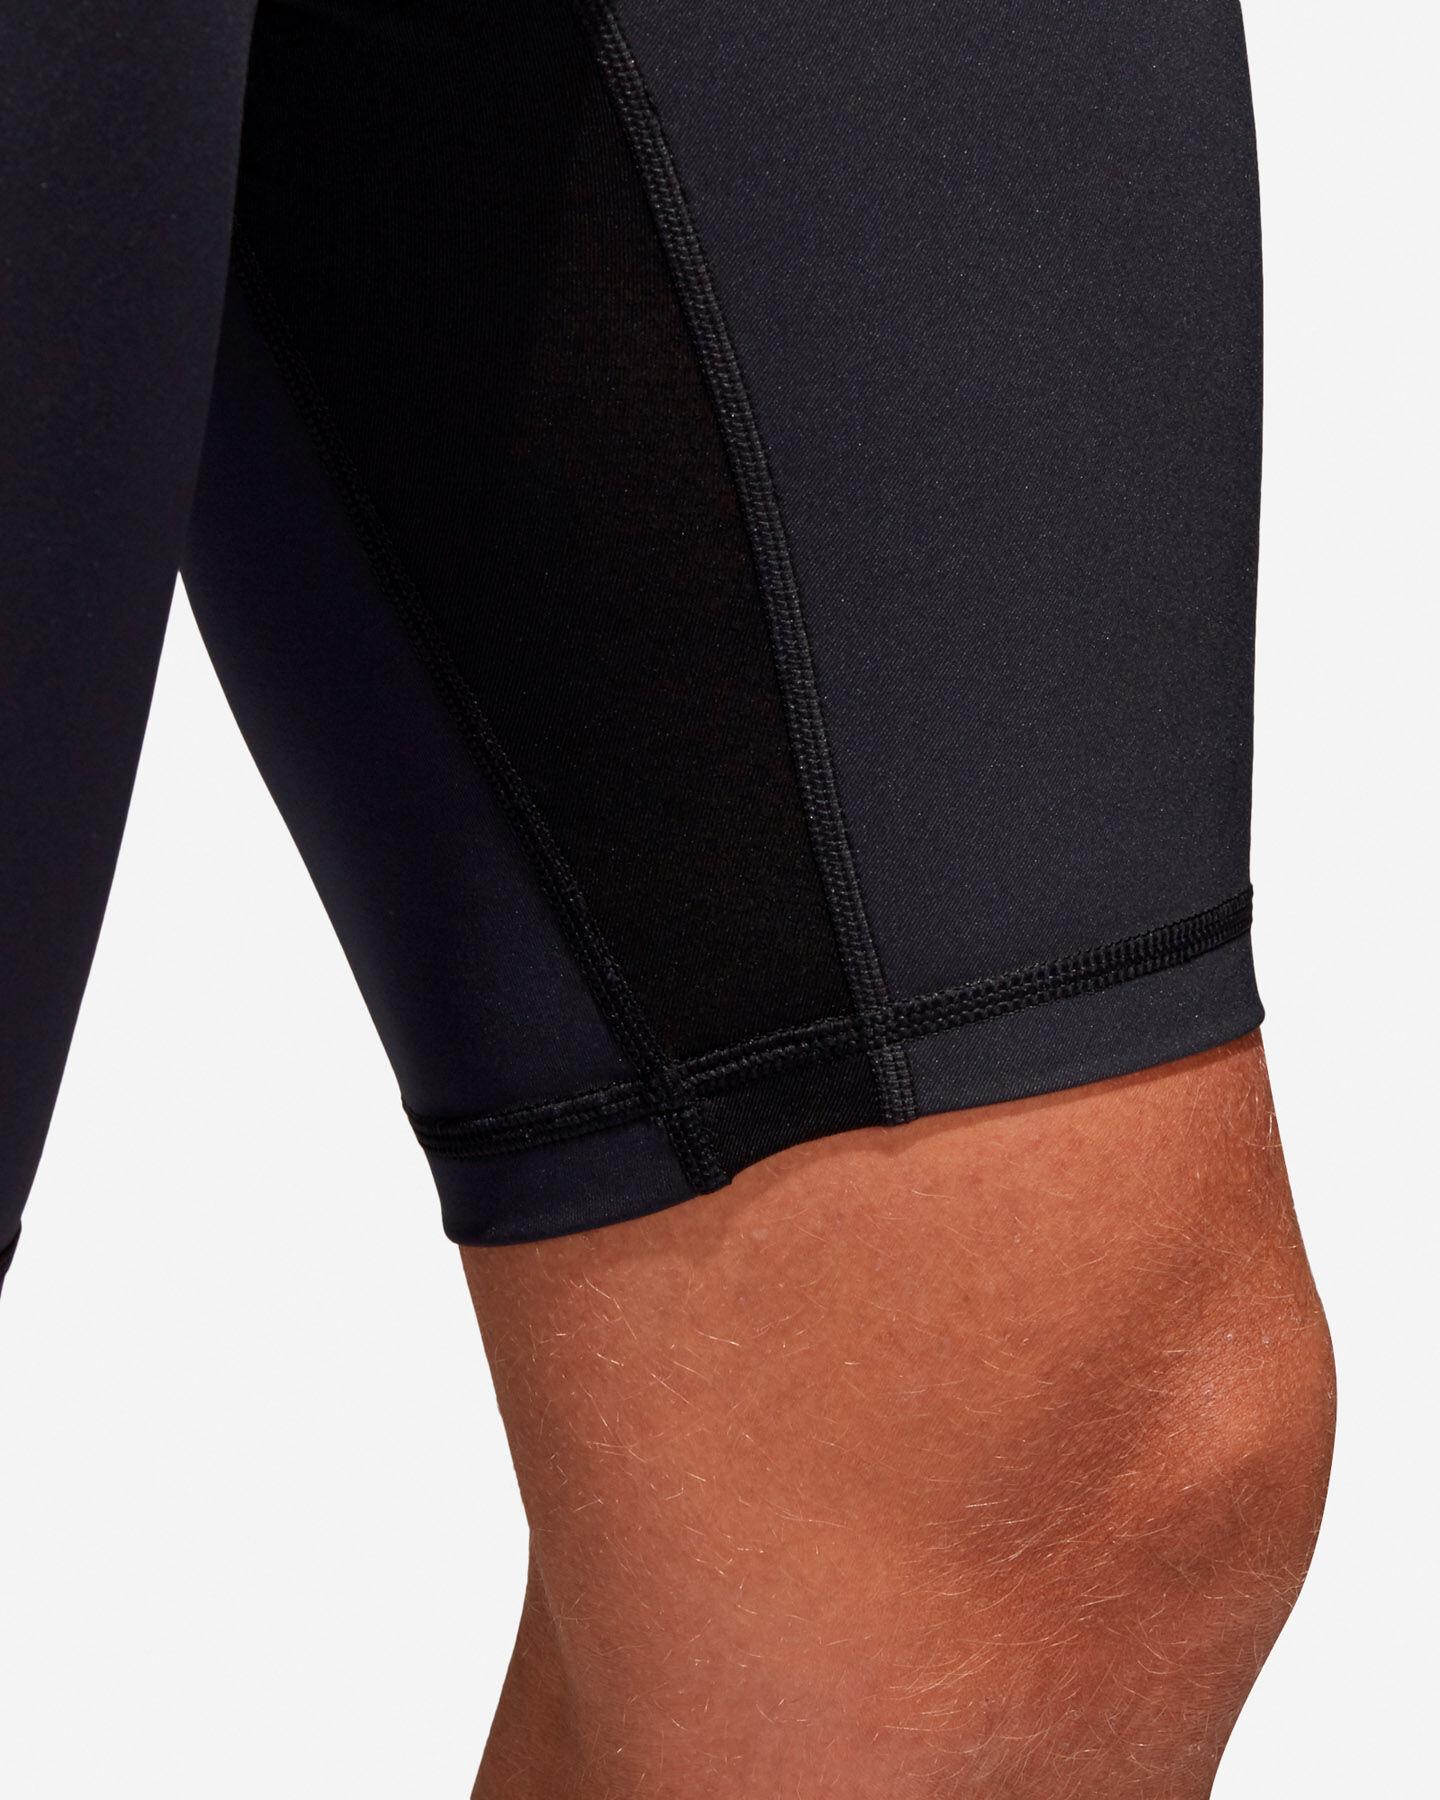 Pantaloncini intimo tecnico ADIDAS ALPHASKIN SPRT TIGHT SHORT TIGHT M S4033462 scatto 5